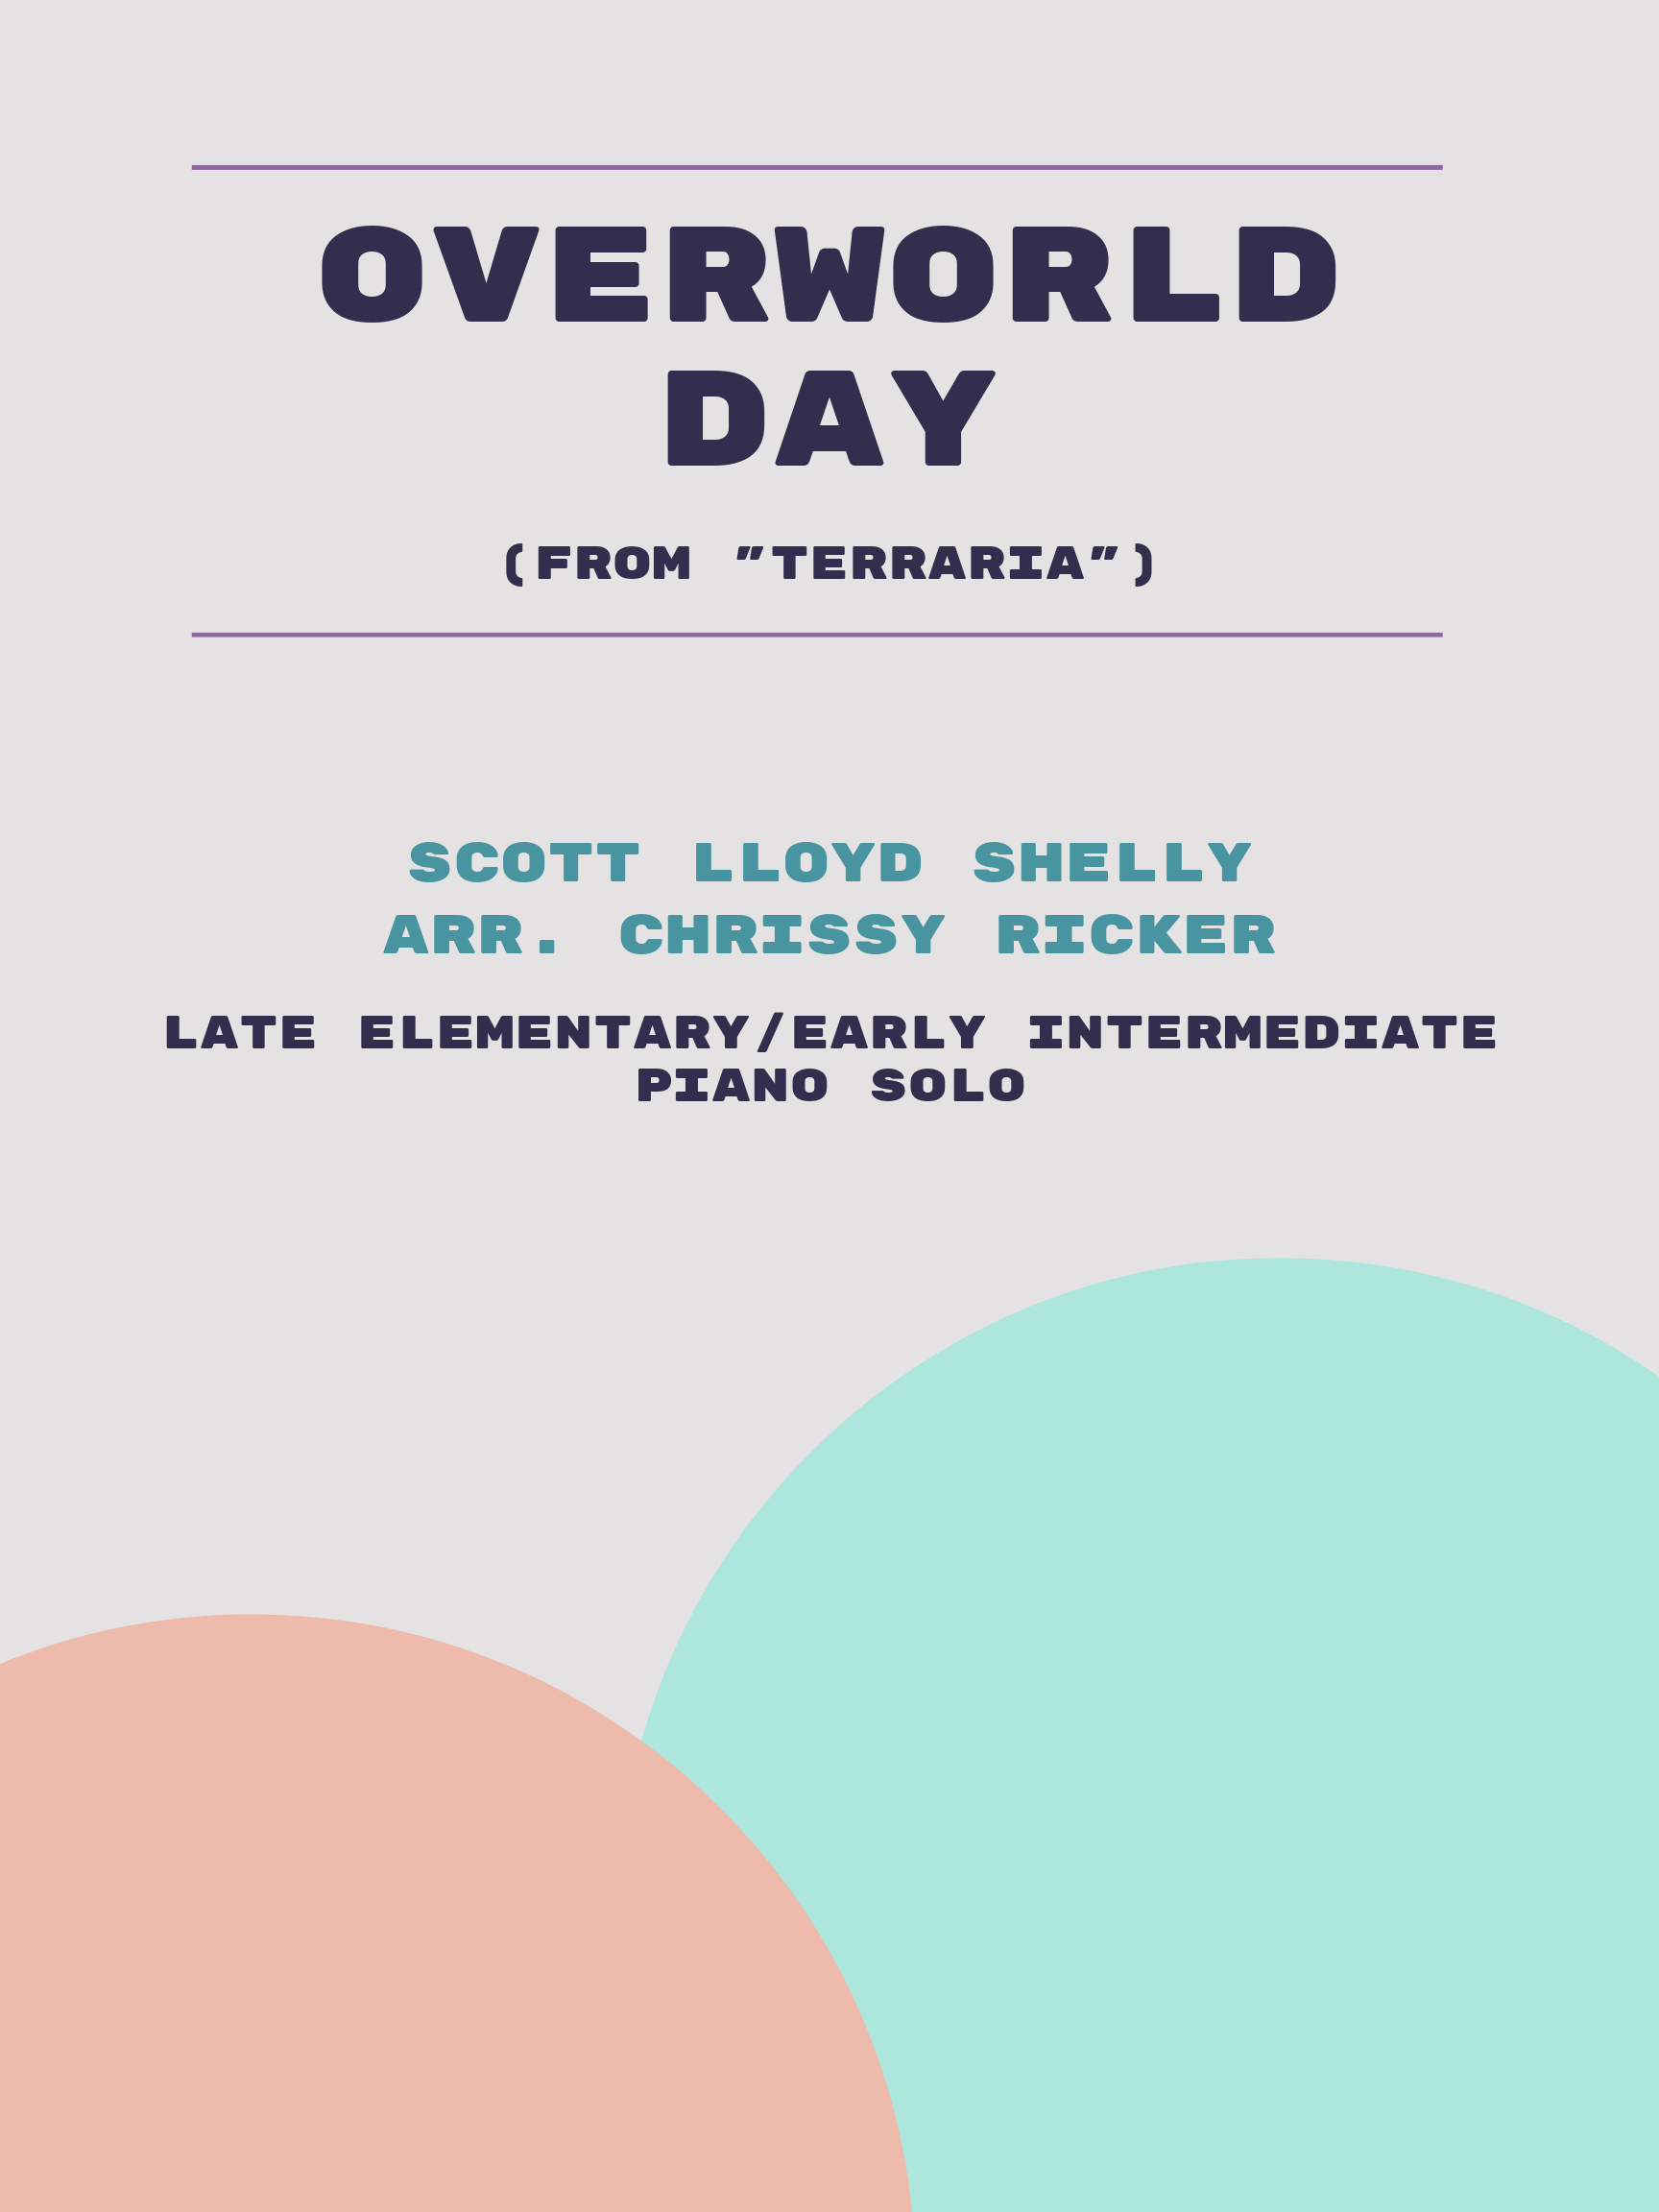 Overworld Day by Scott Lloyd Shelly